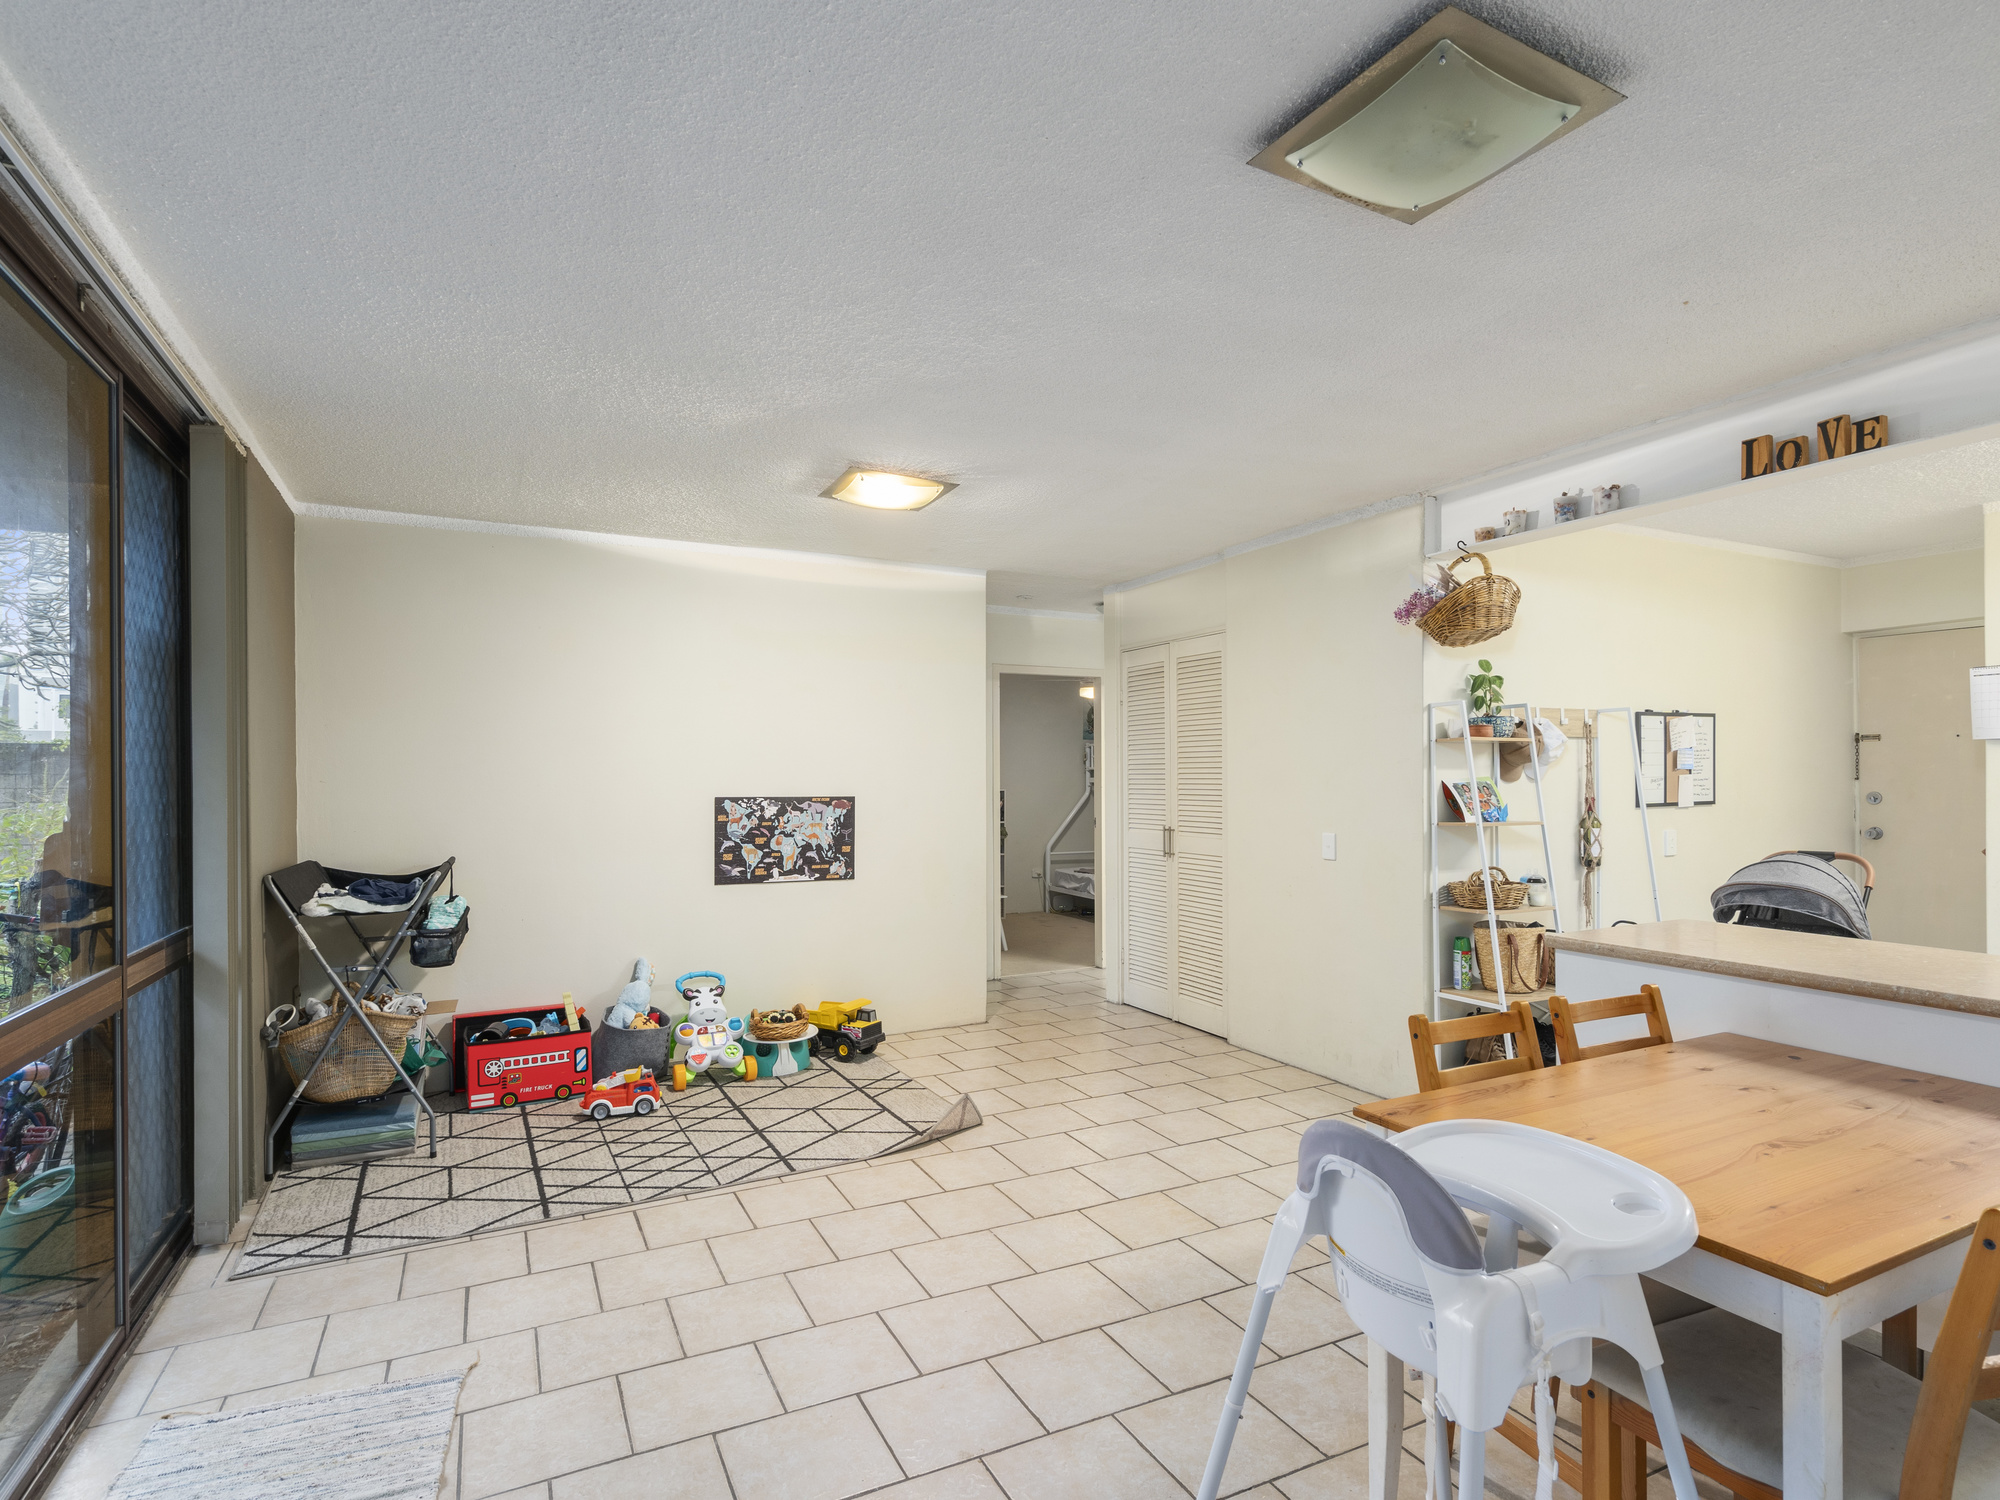 Real Estate | Gold Coast | Chevron Realty | 005 Open2view Id698602 2 33 Darrambal Street